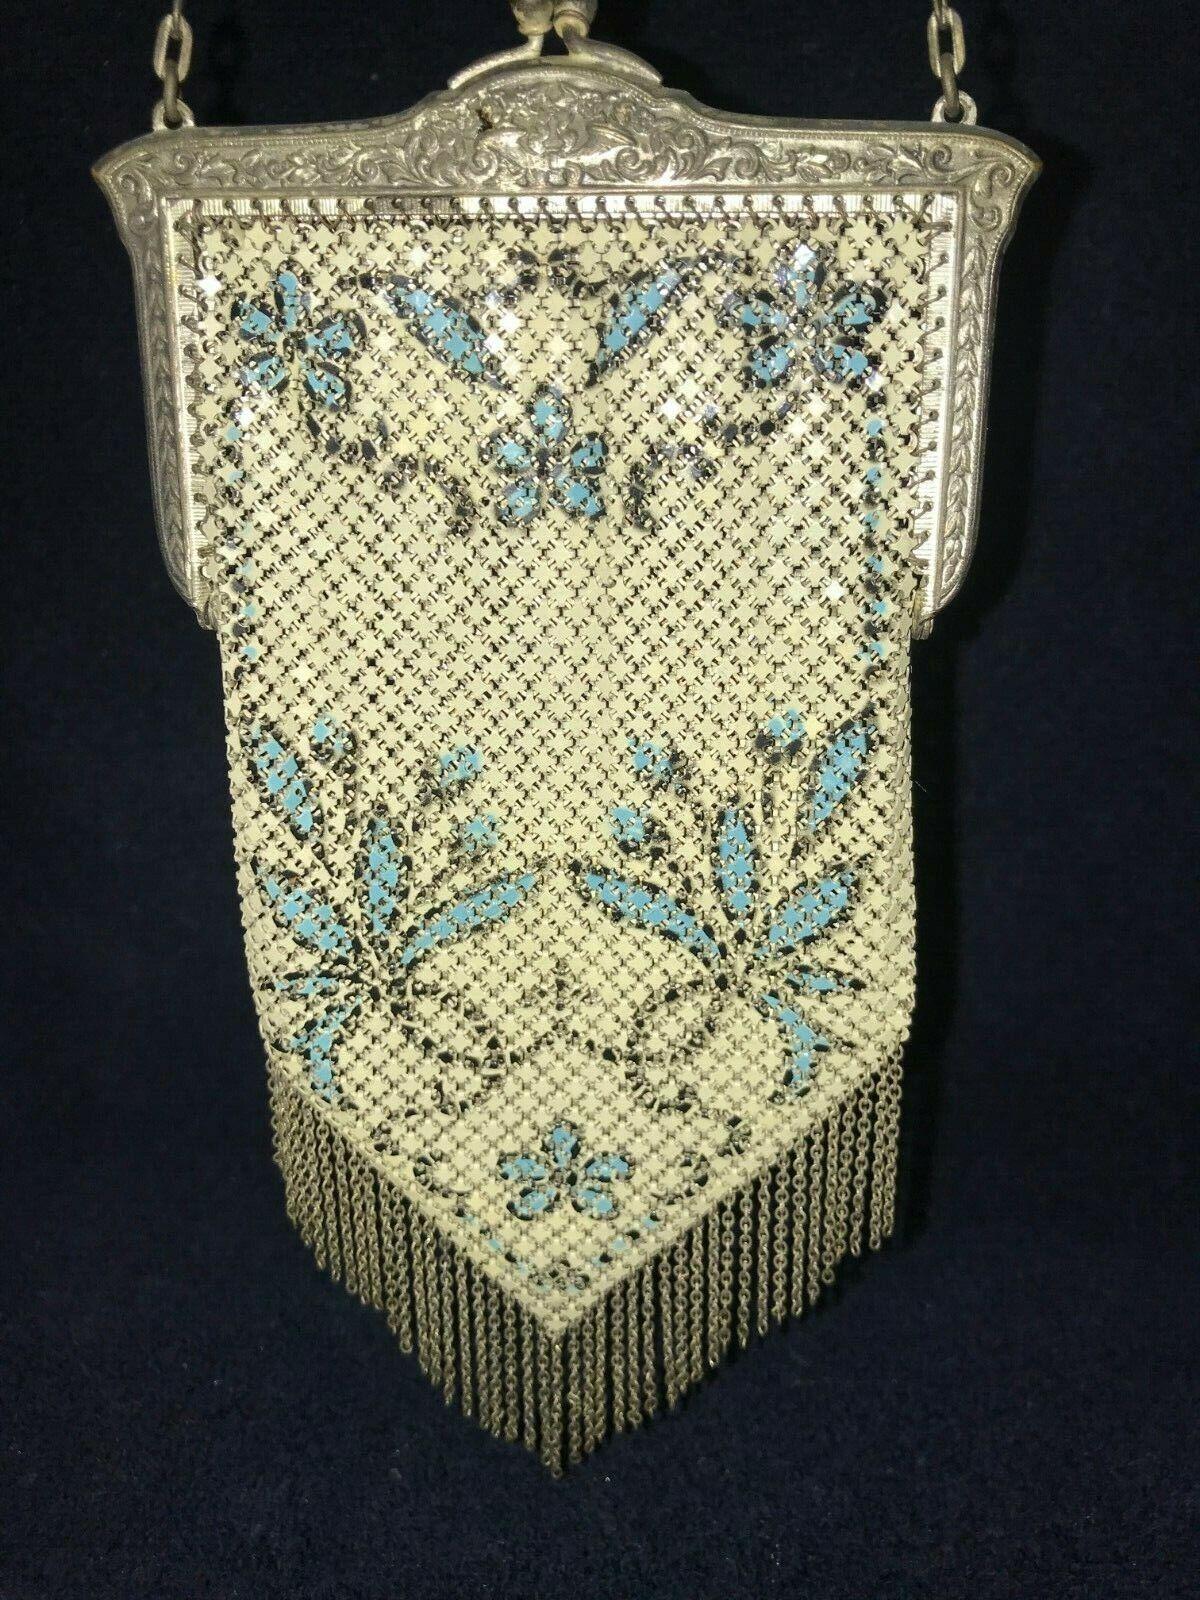 Vintage Mandalian Mfg Co Enamel? Metal Mesh Purse… - image 1